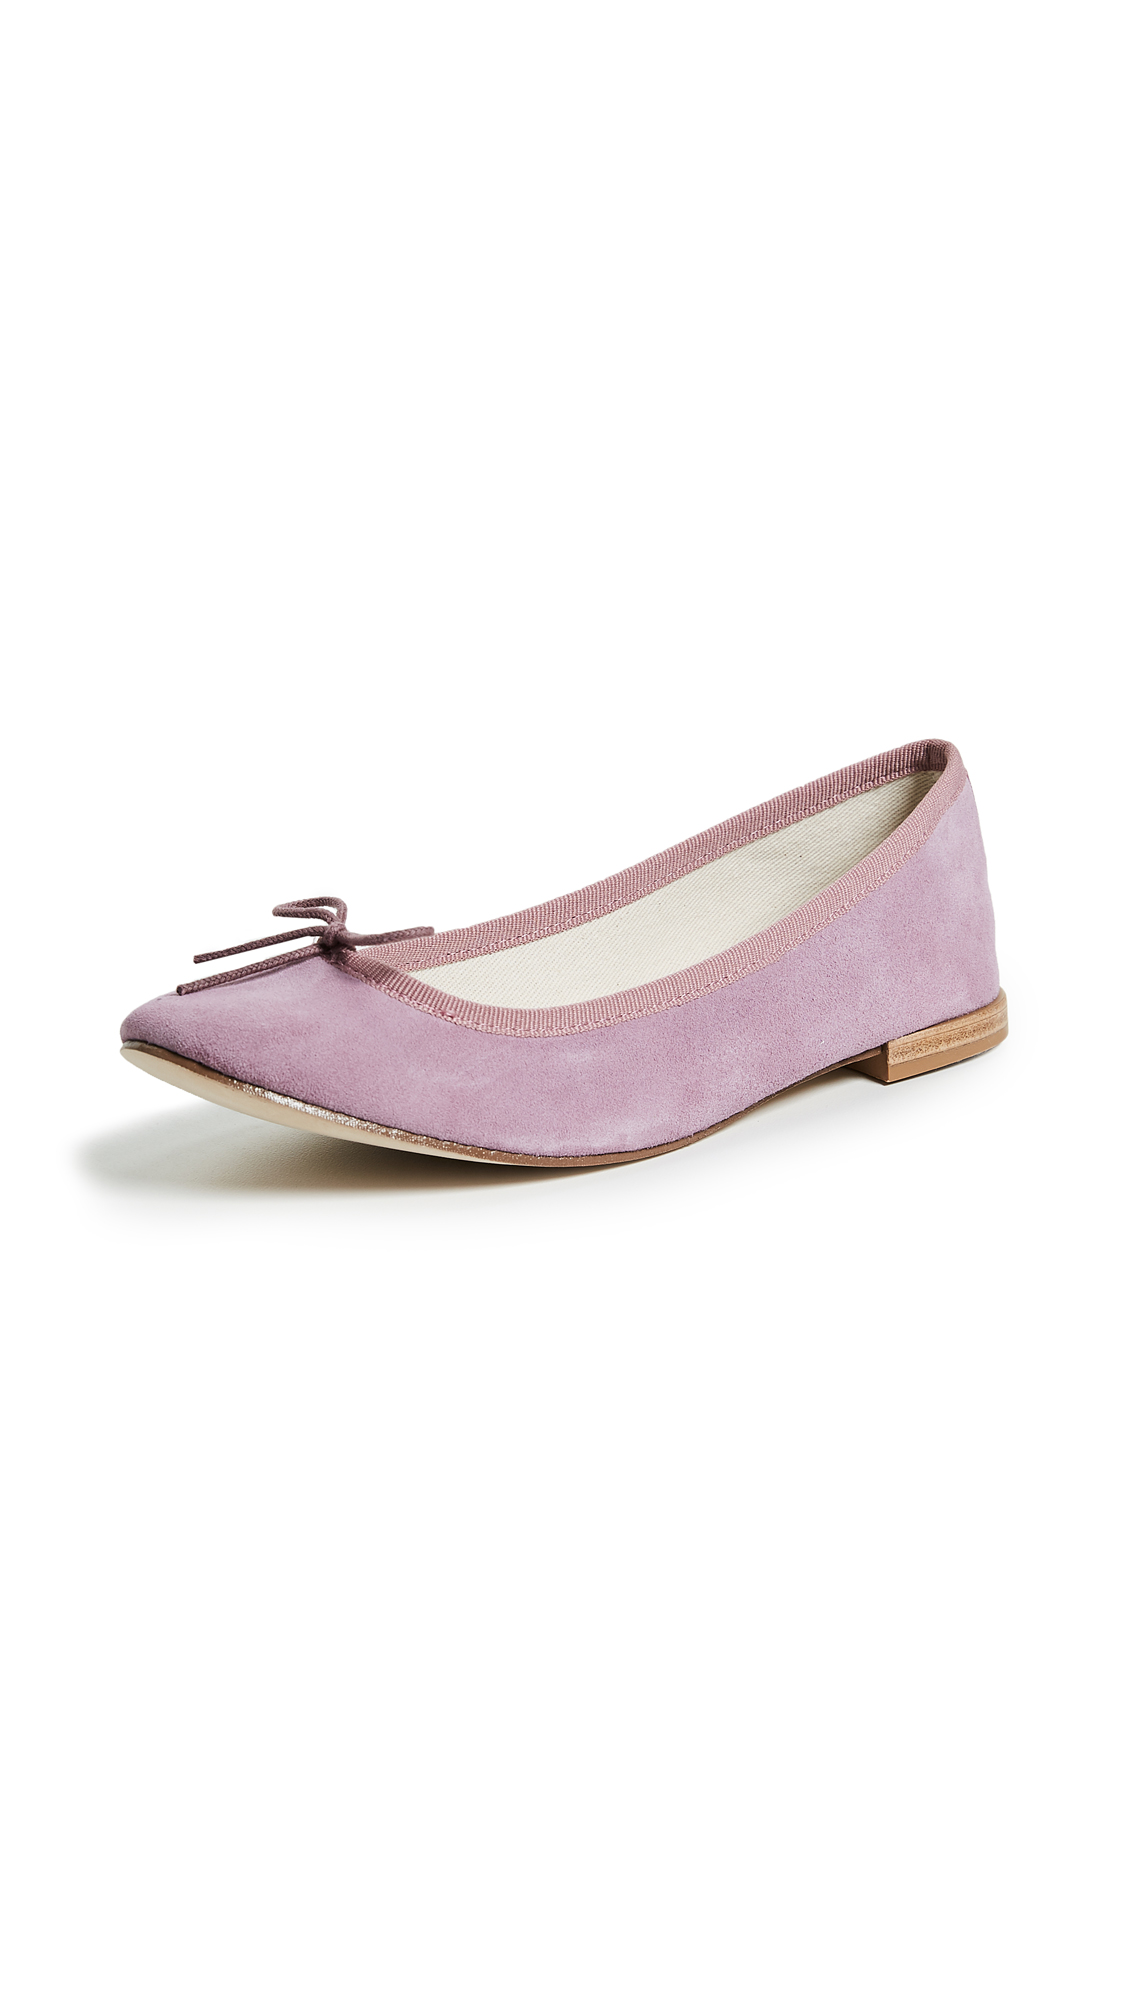 Repetto Cendrillon Ballet Flats - Pale Pink